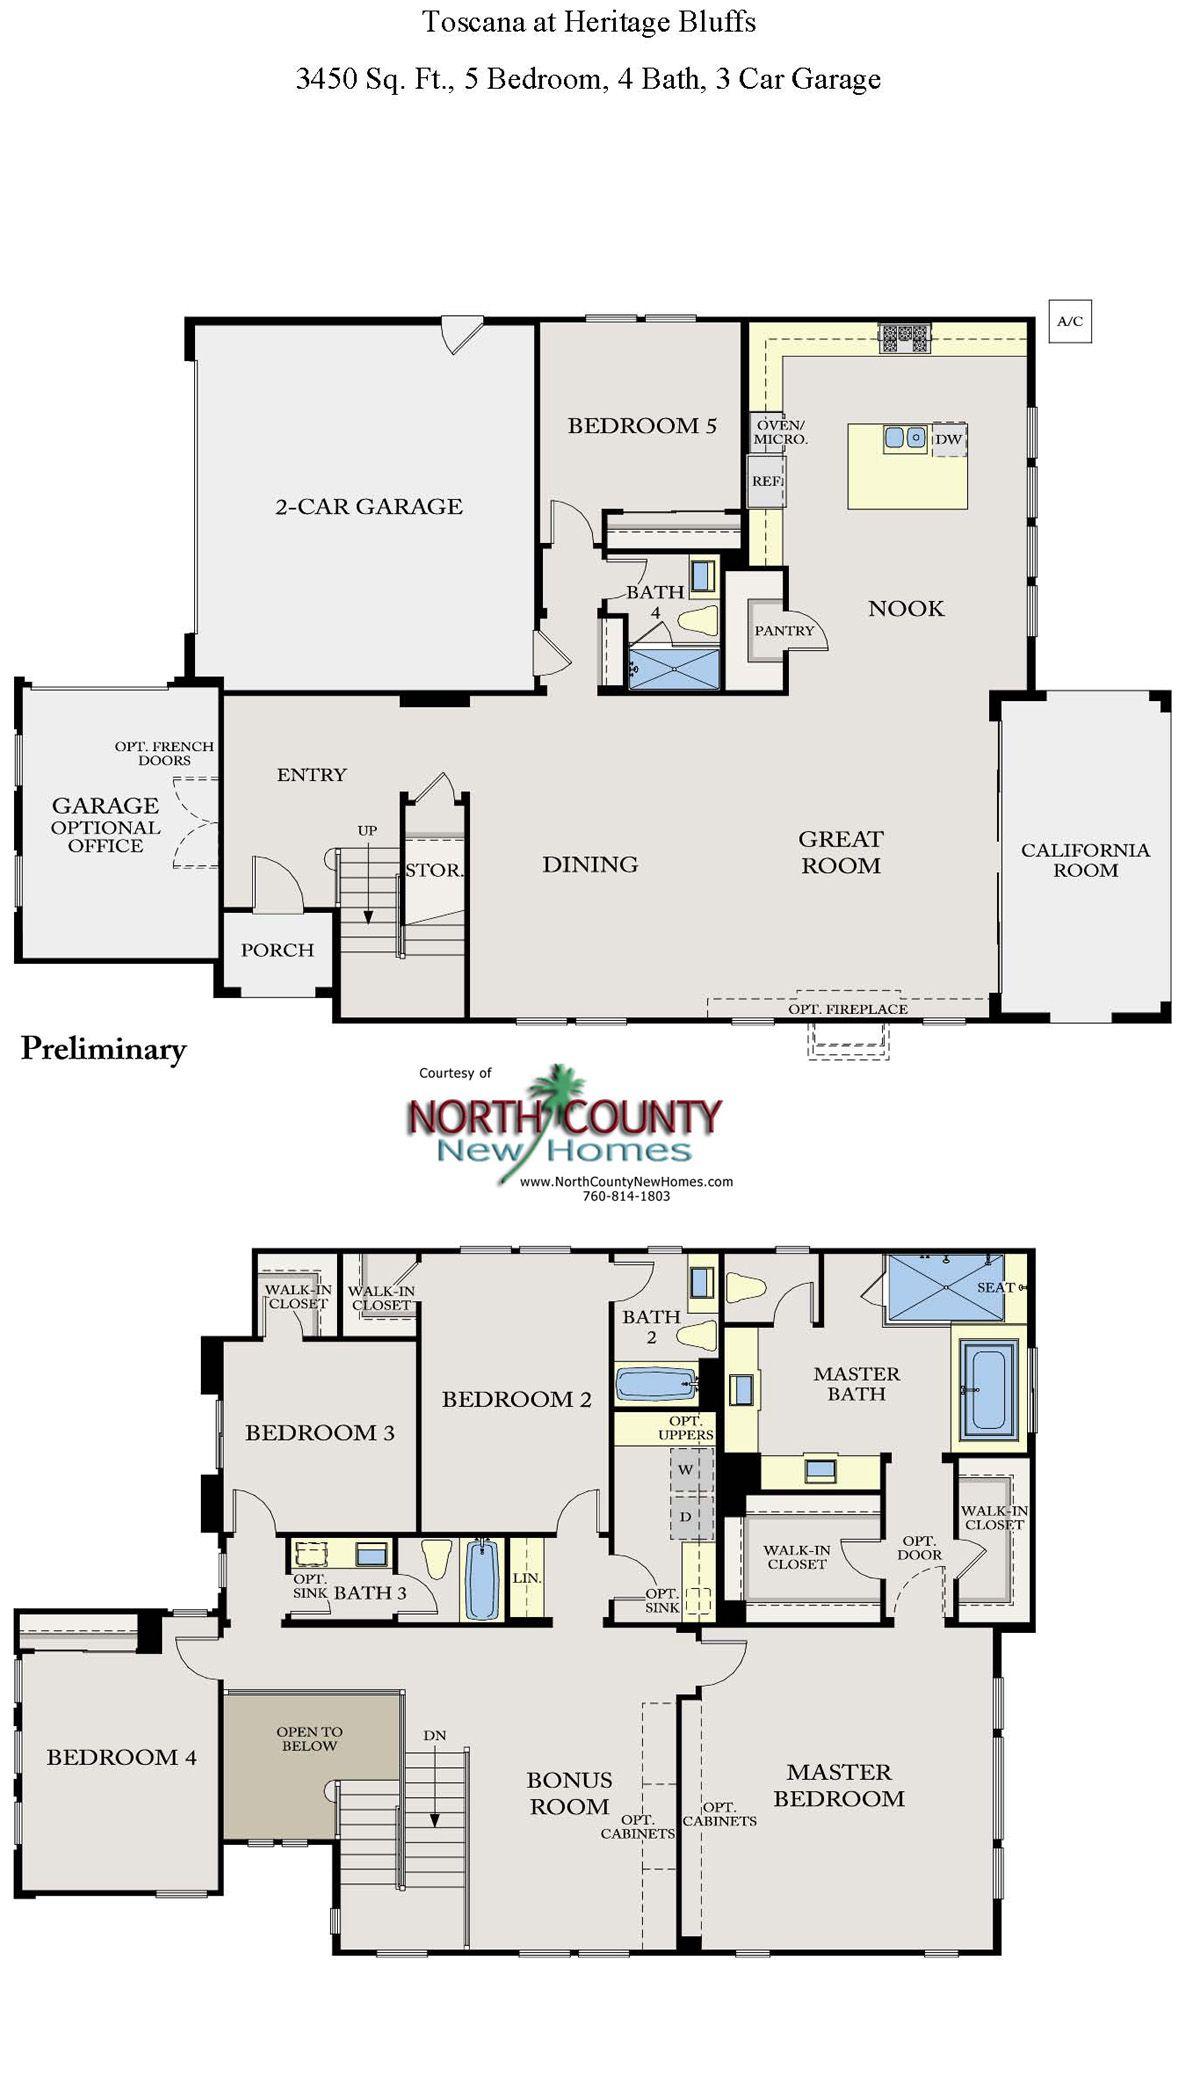 Toscana New Homes in San Diego Floor Plans Floor plans